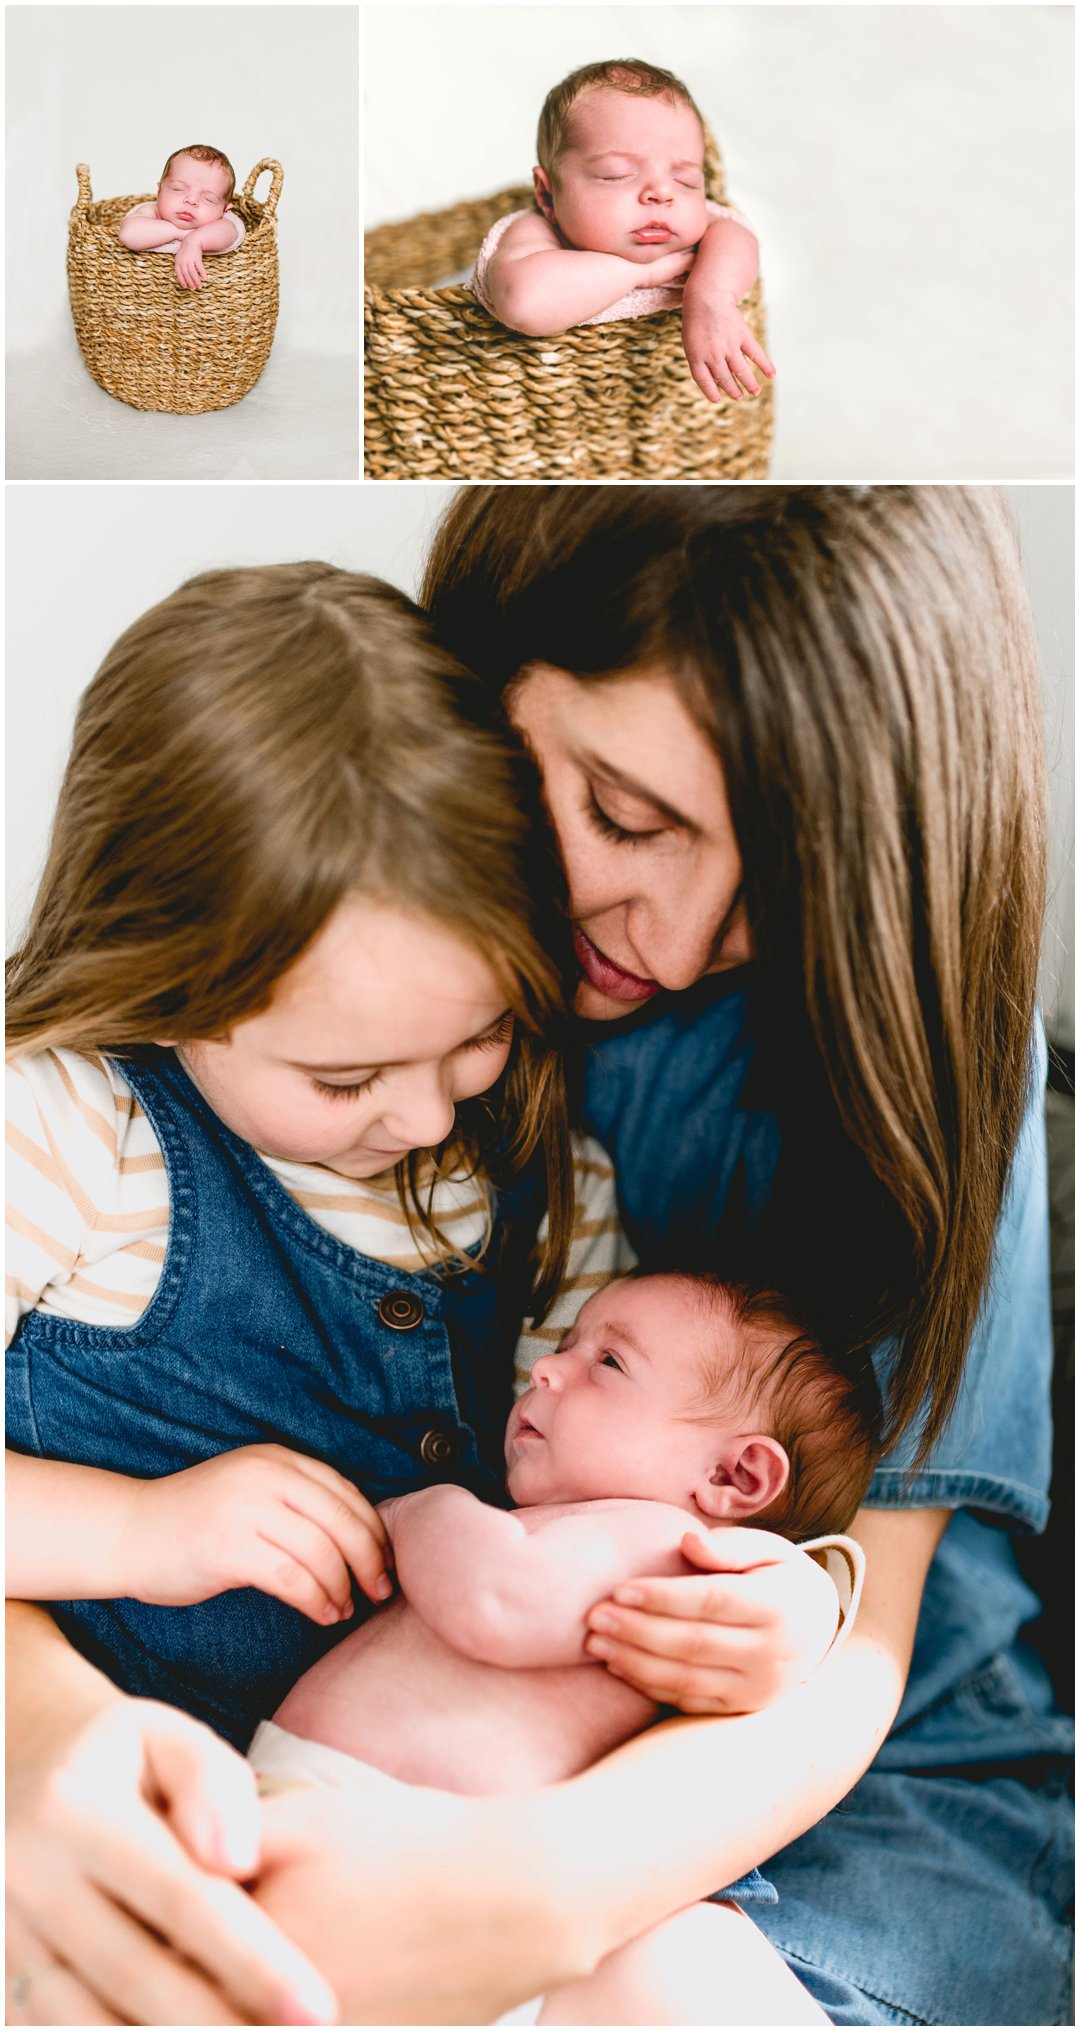 Newborn shoot, newborn photographer, West Midlands baby photos, Sutton Coldfield newborn photography, photos, Lisa Carpenter Photography, wedding photographer, lifestyle, inspiration, Connie and Clash, welcome to the world